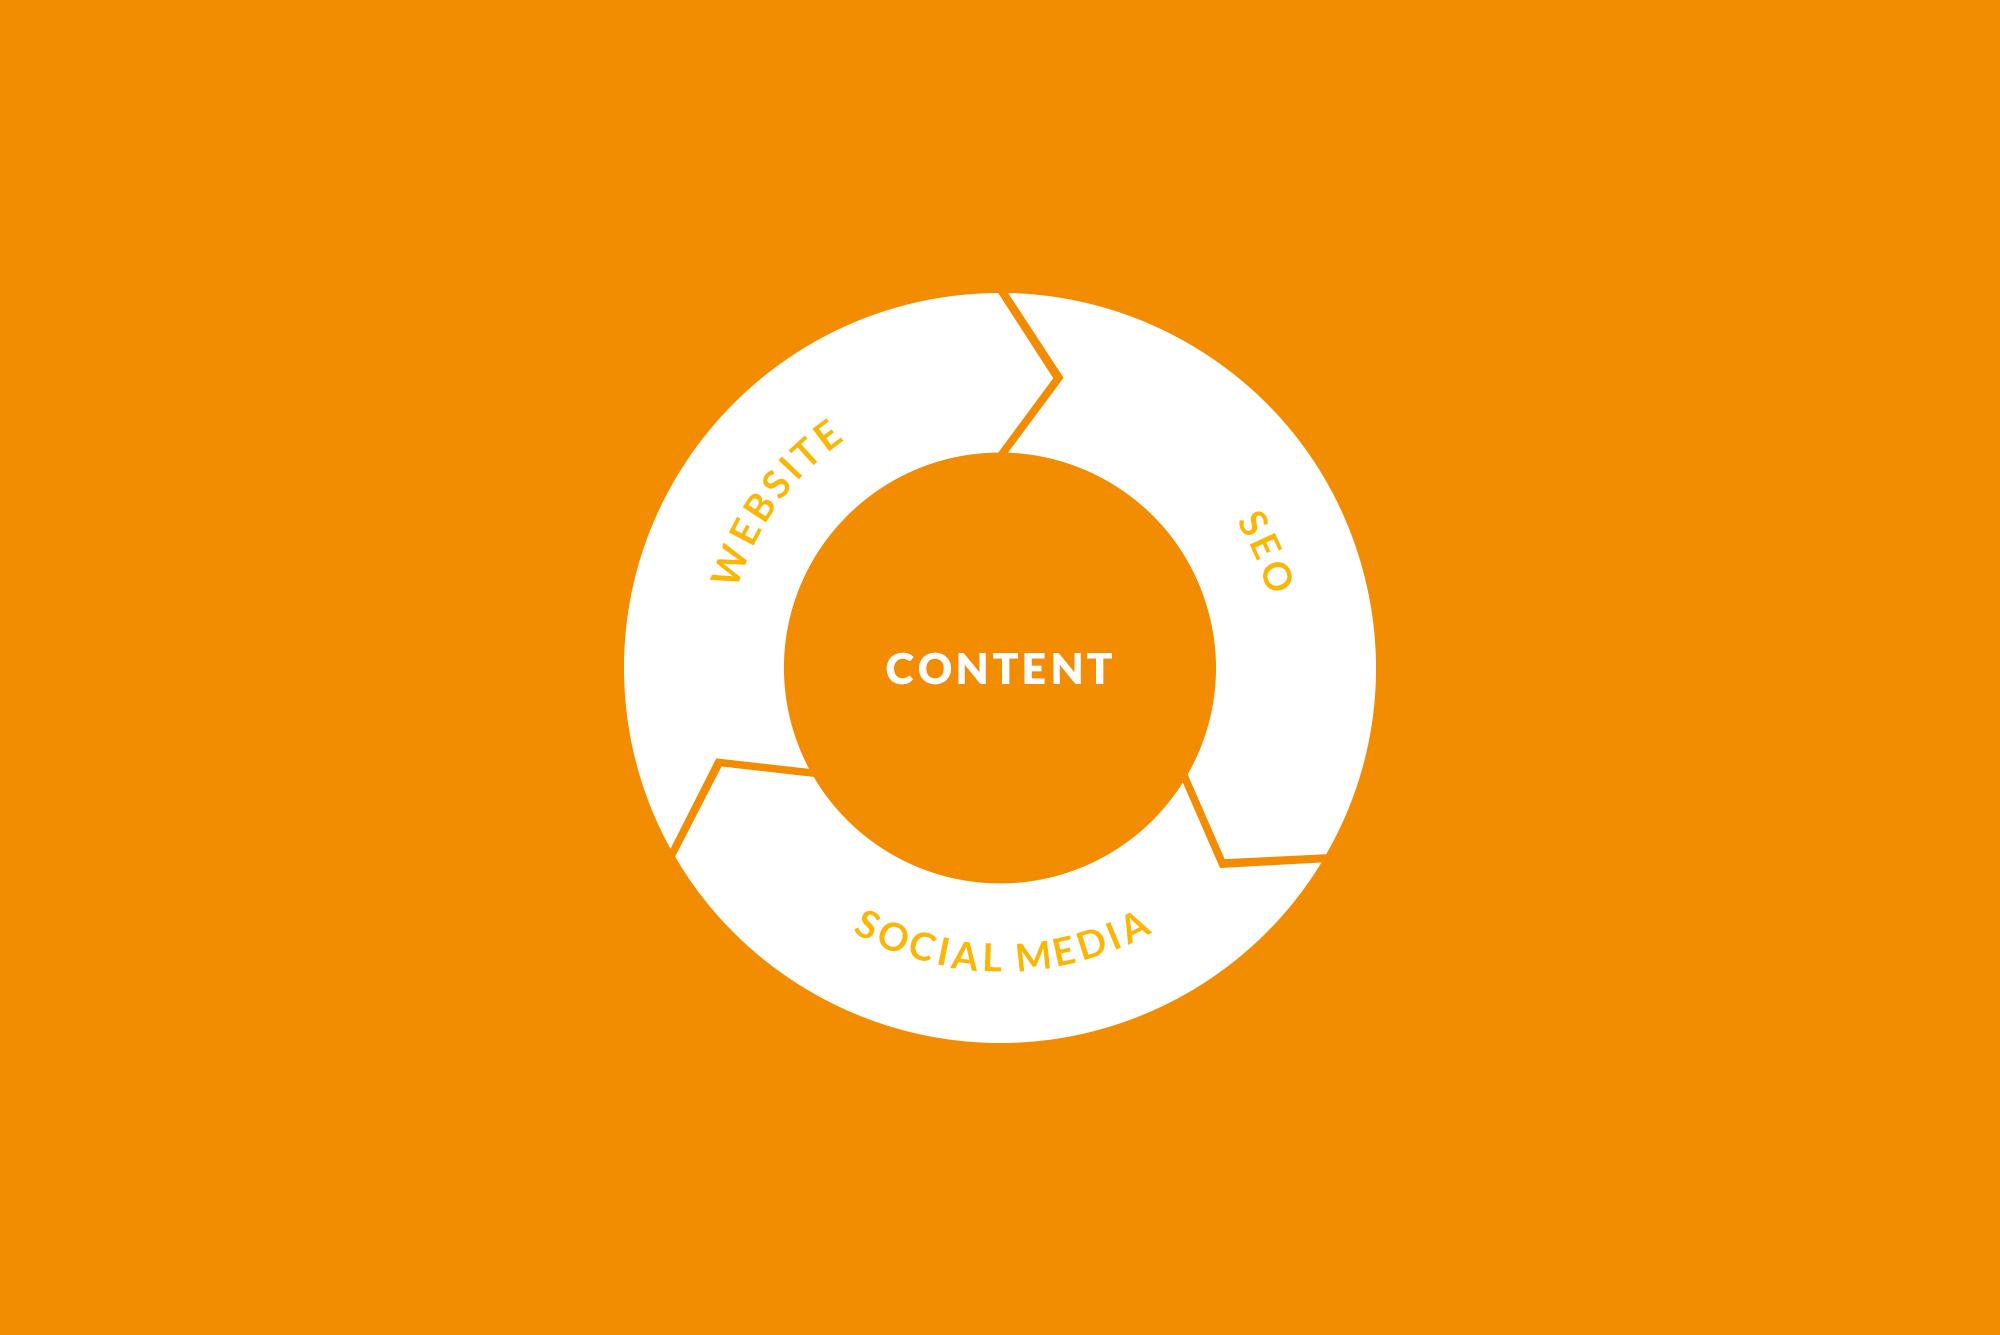 Content wheel on orange background - SEO strategy tips